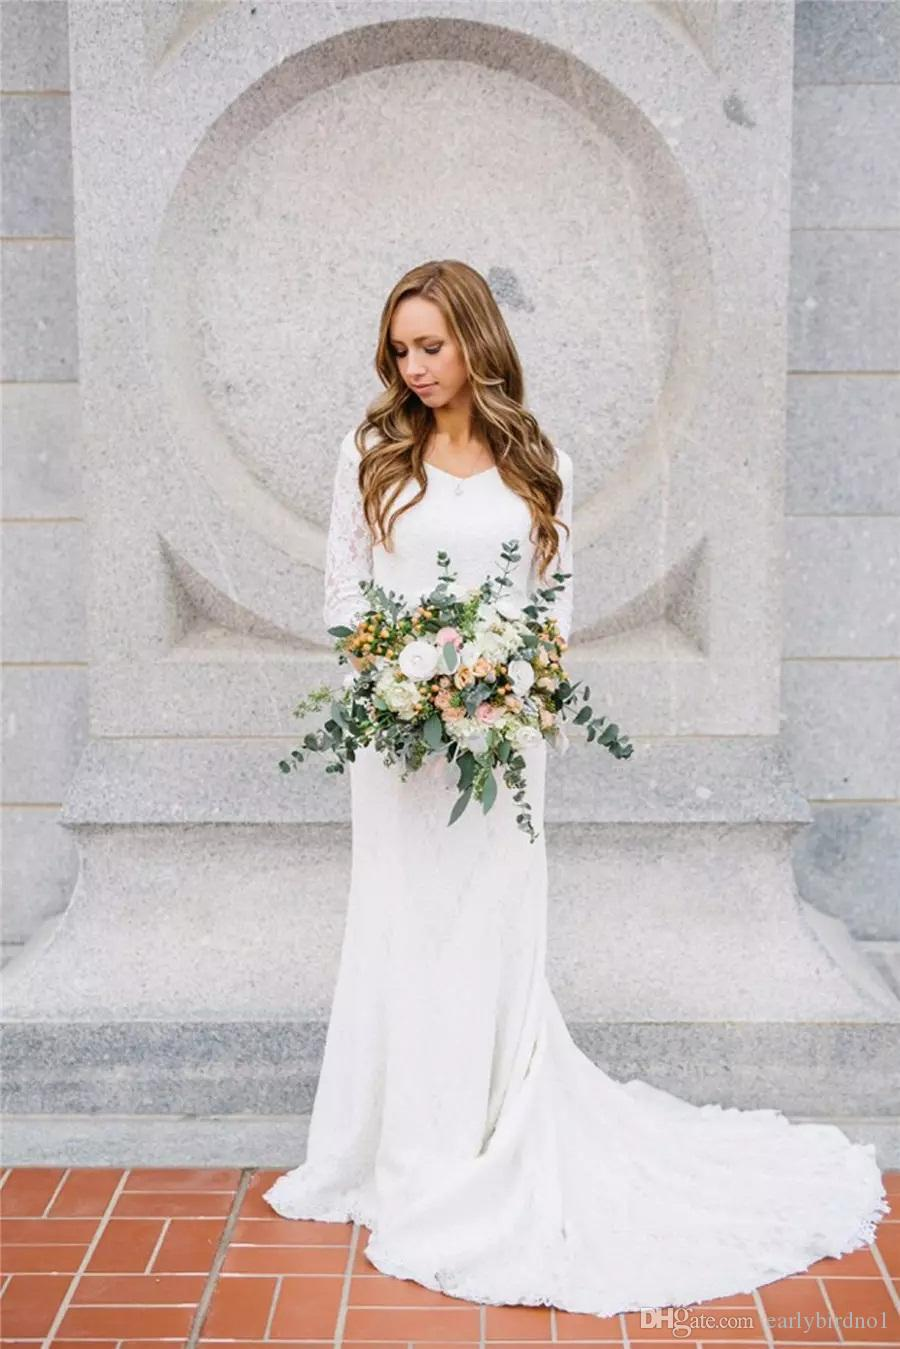 2018 nieuwe vintage bescheiden trouwjurken met lange mouwen Boheemse kant chiffon bruidsjurken land trouwjurk